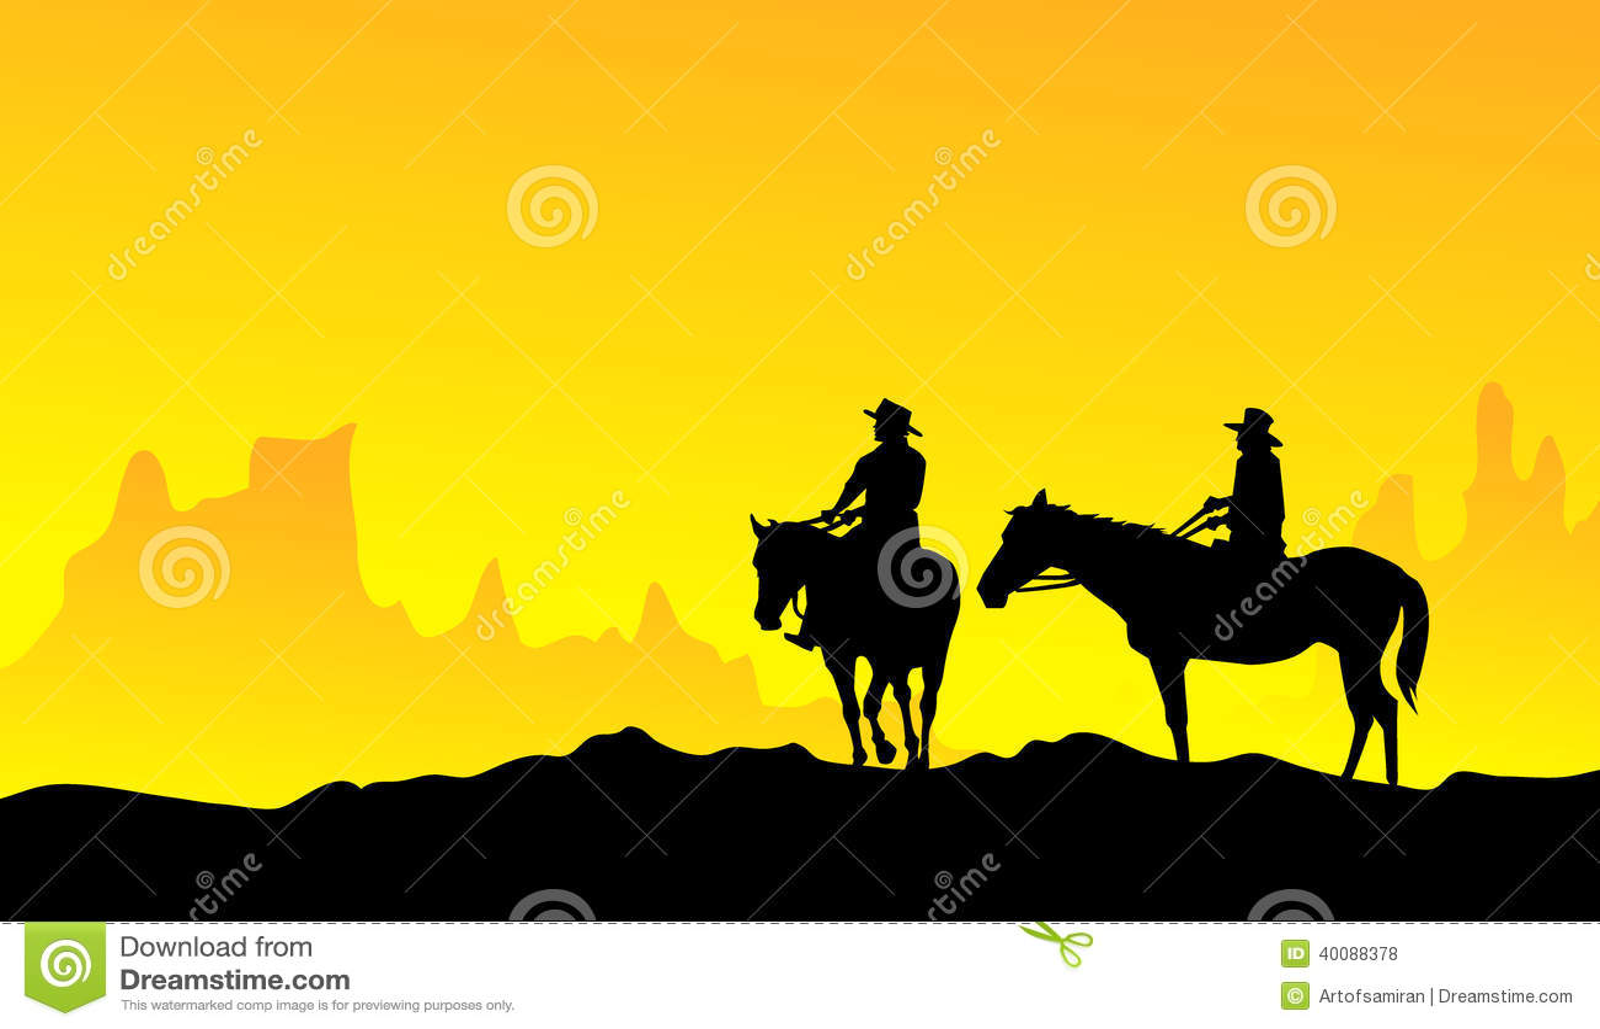 Cowboy vector - photo#28